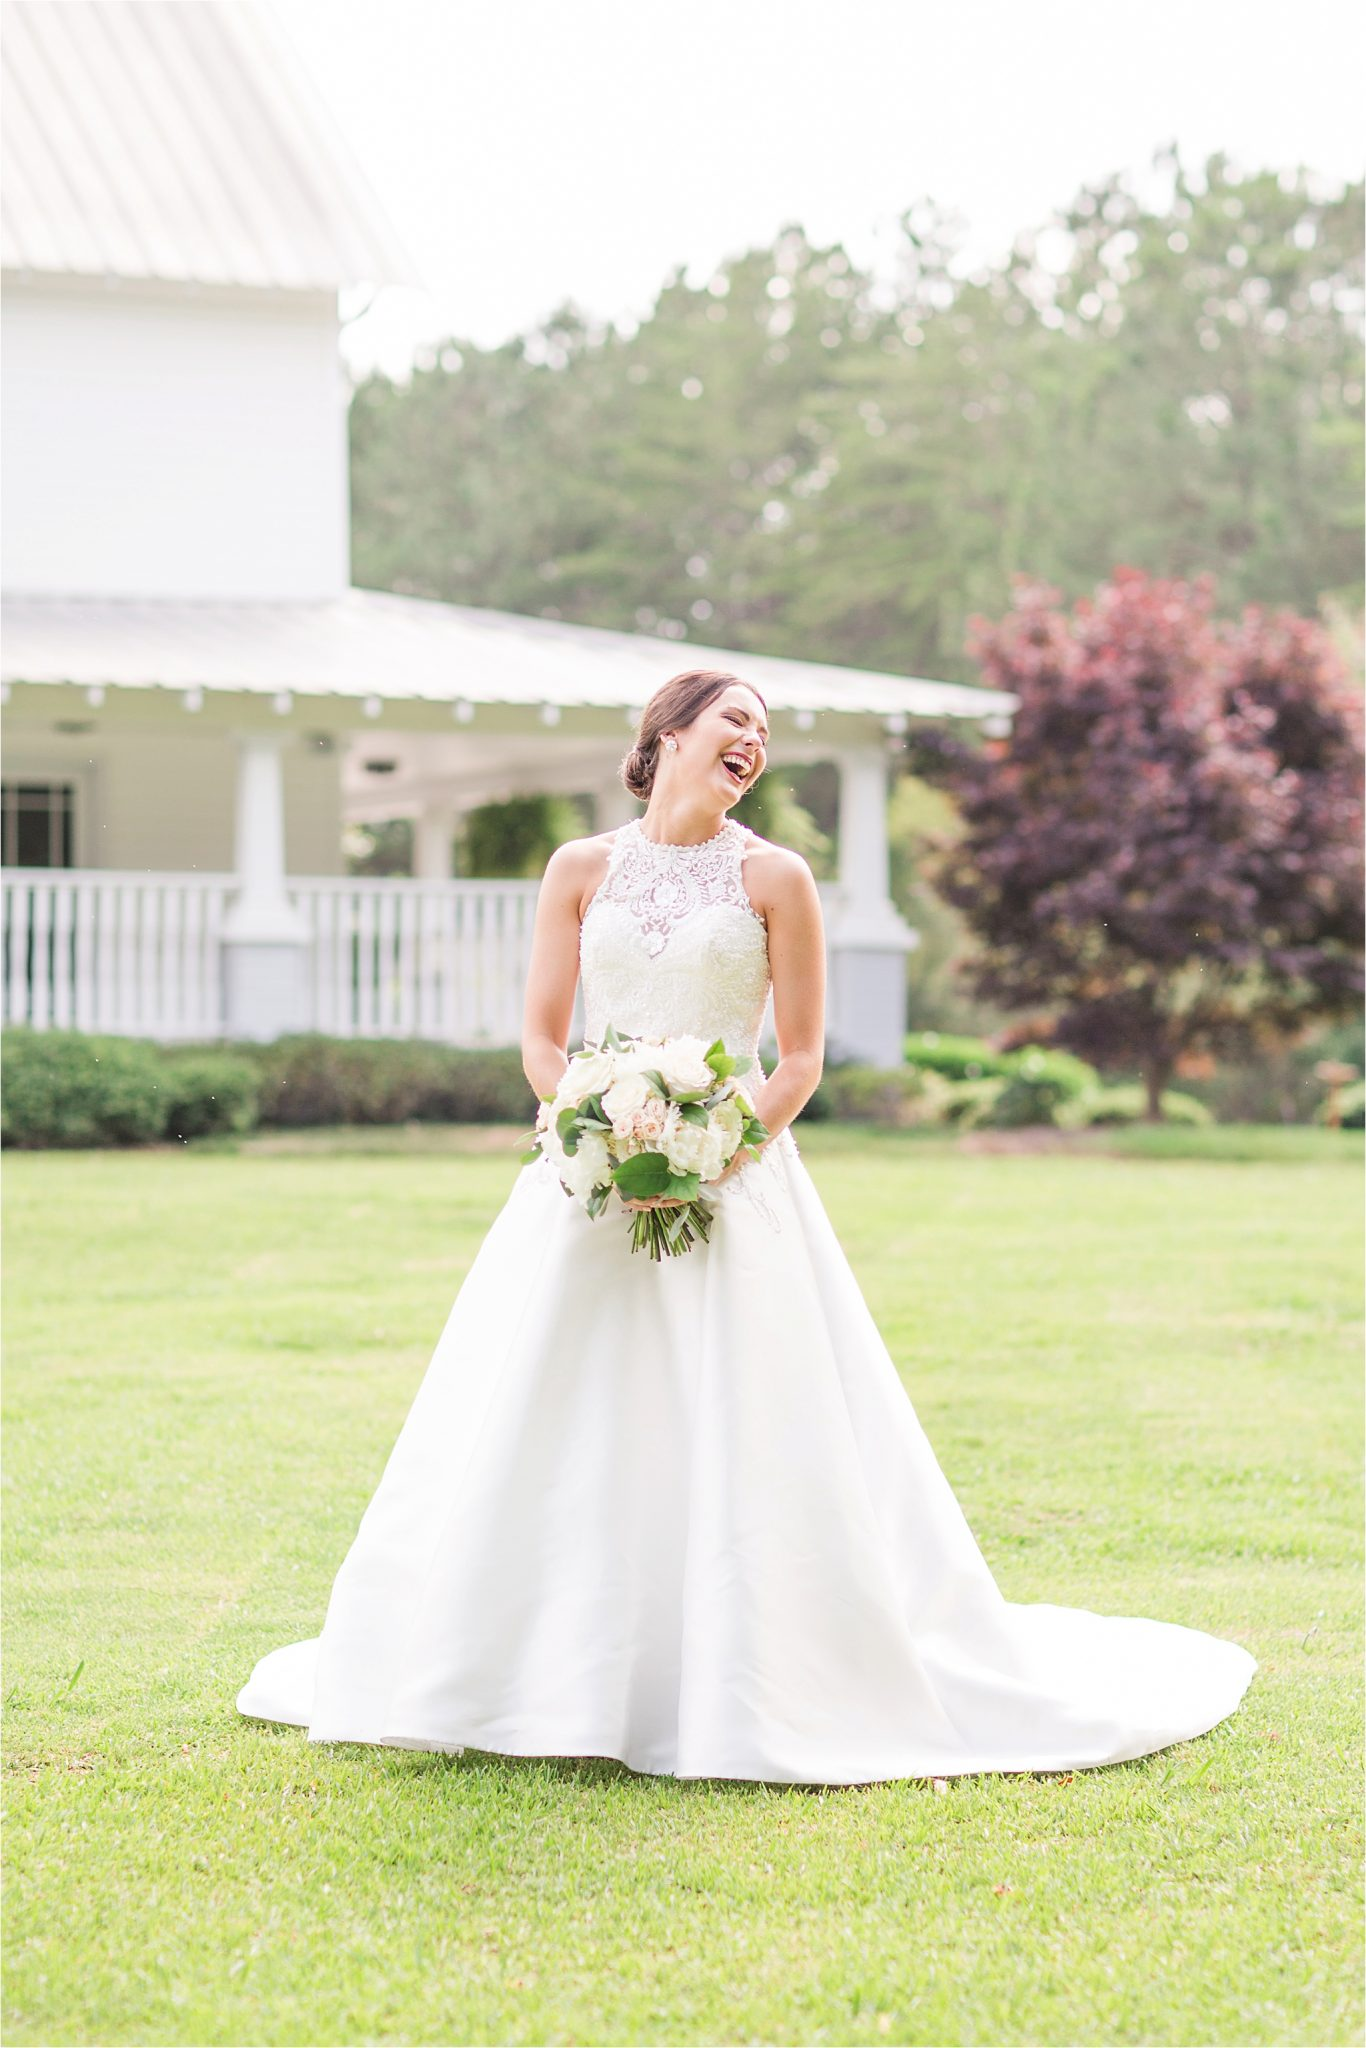 Sonnet House, Birmingham Alabama Wedding Photographer, Bridal portrait, Wedding bouquets